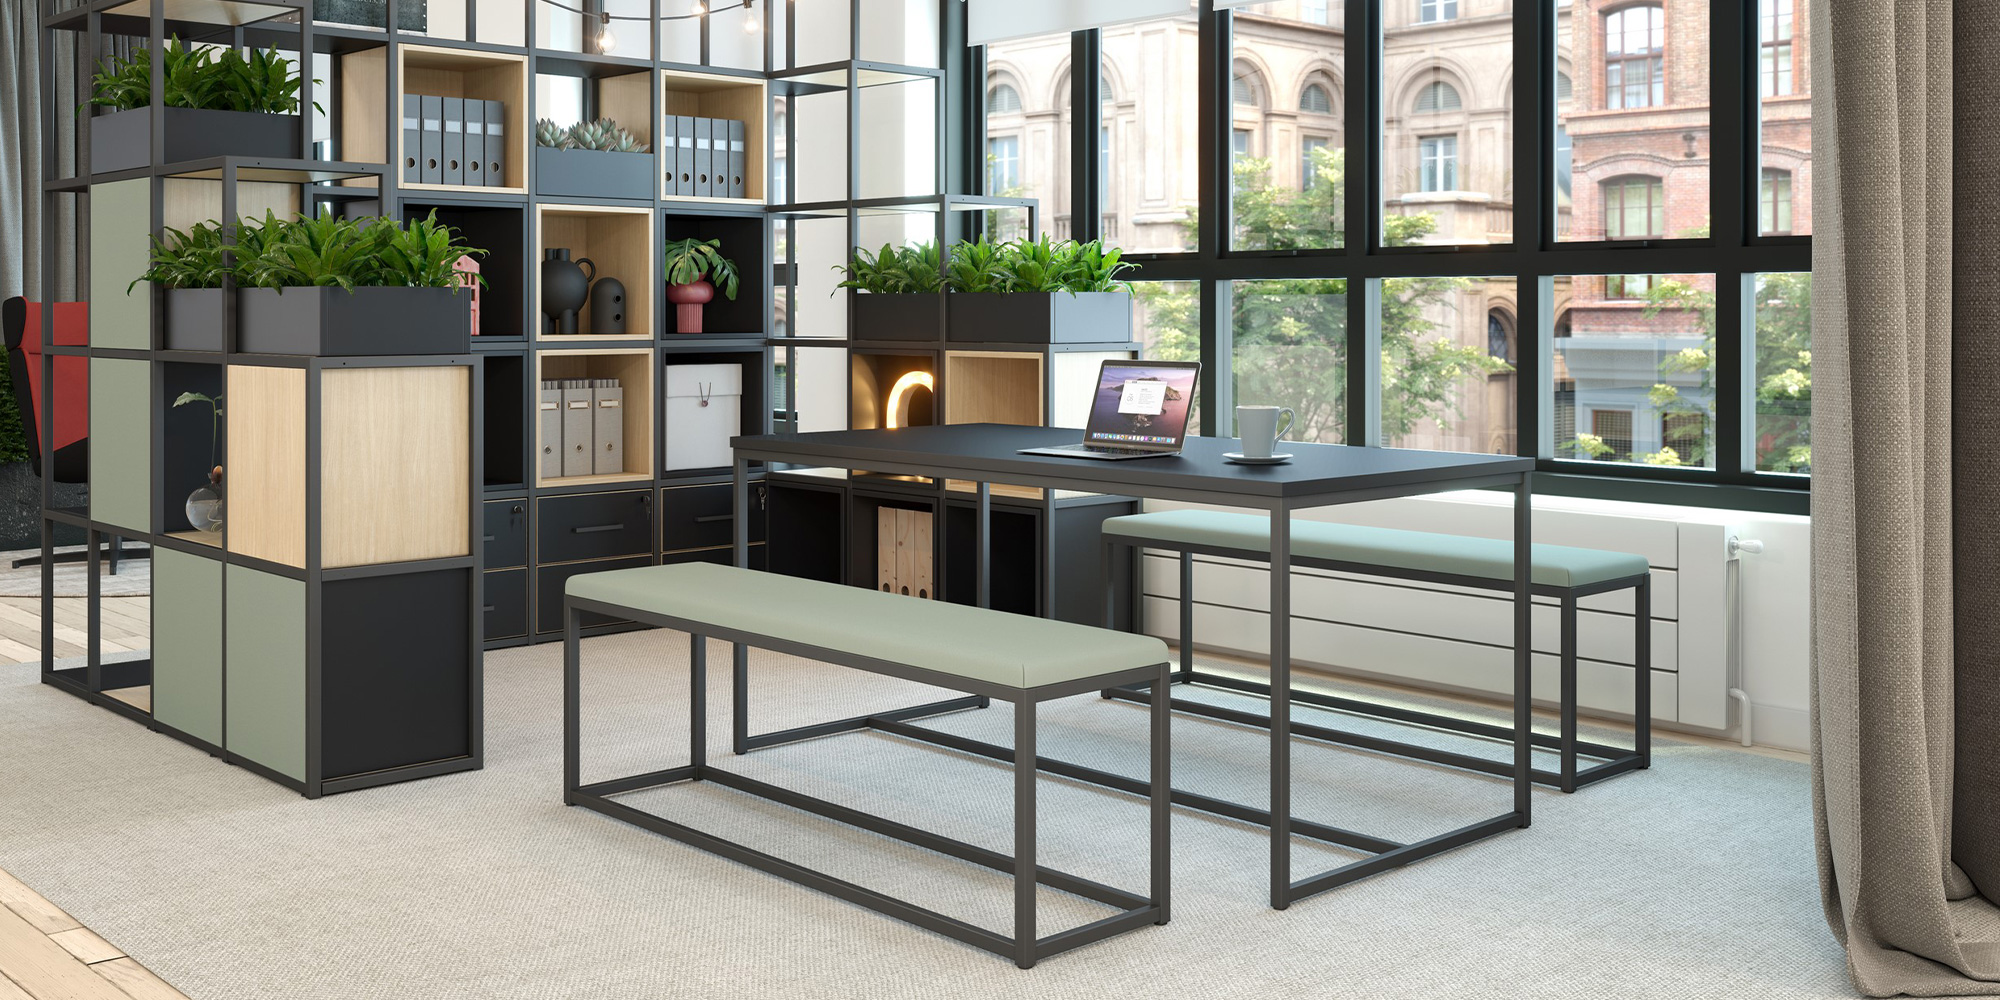 Cubeform Bench Roomset